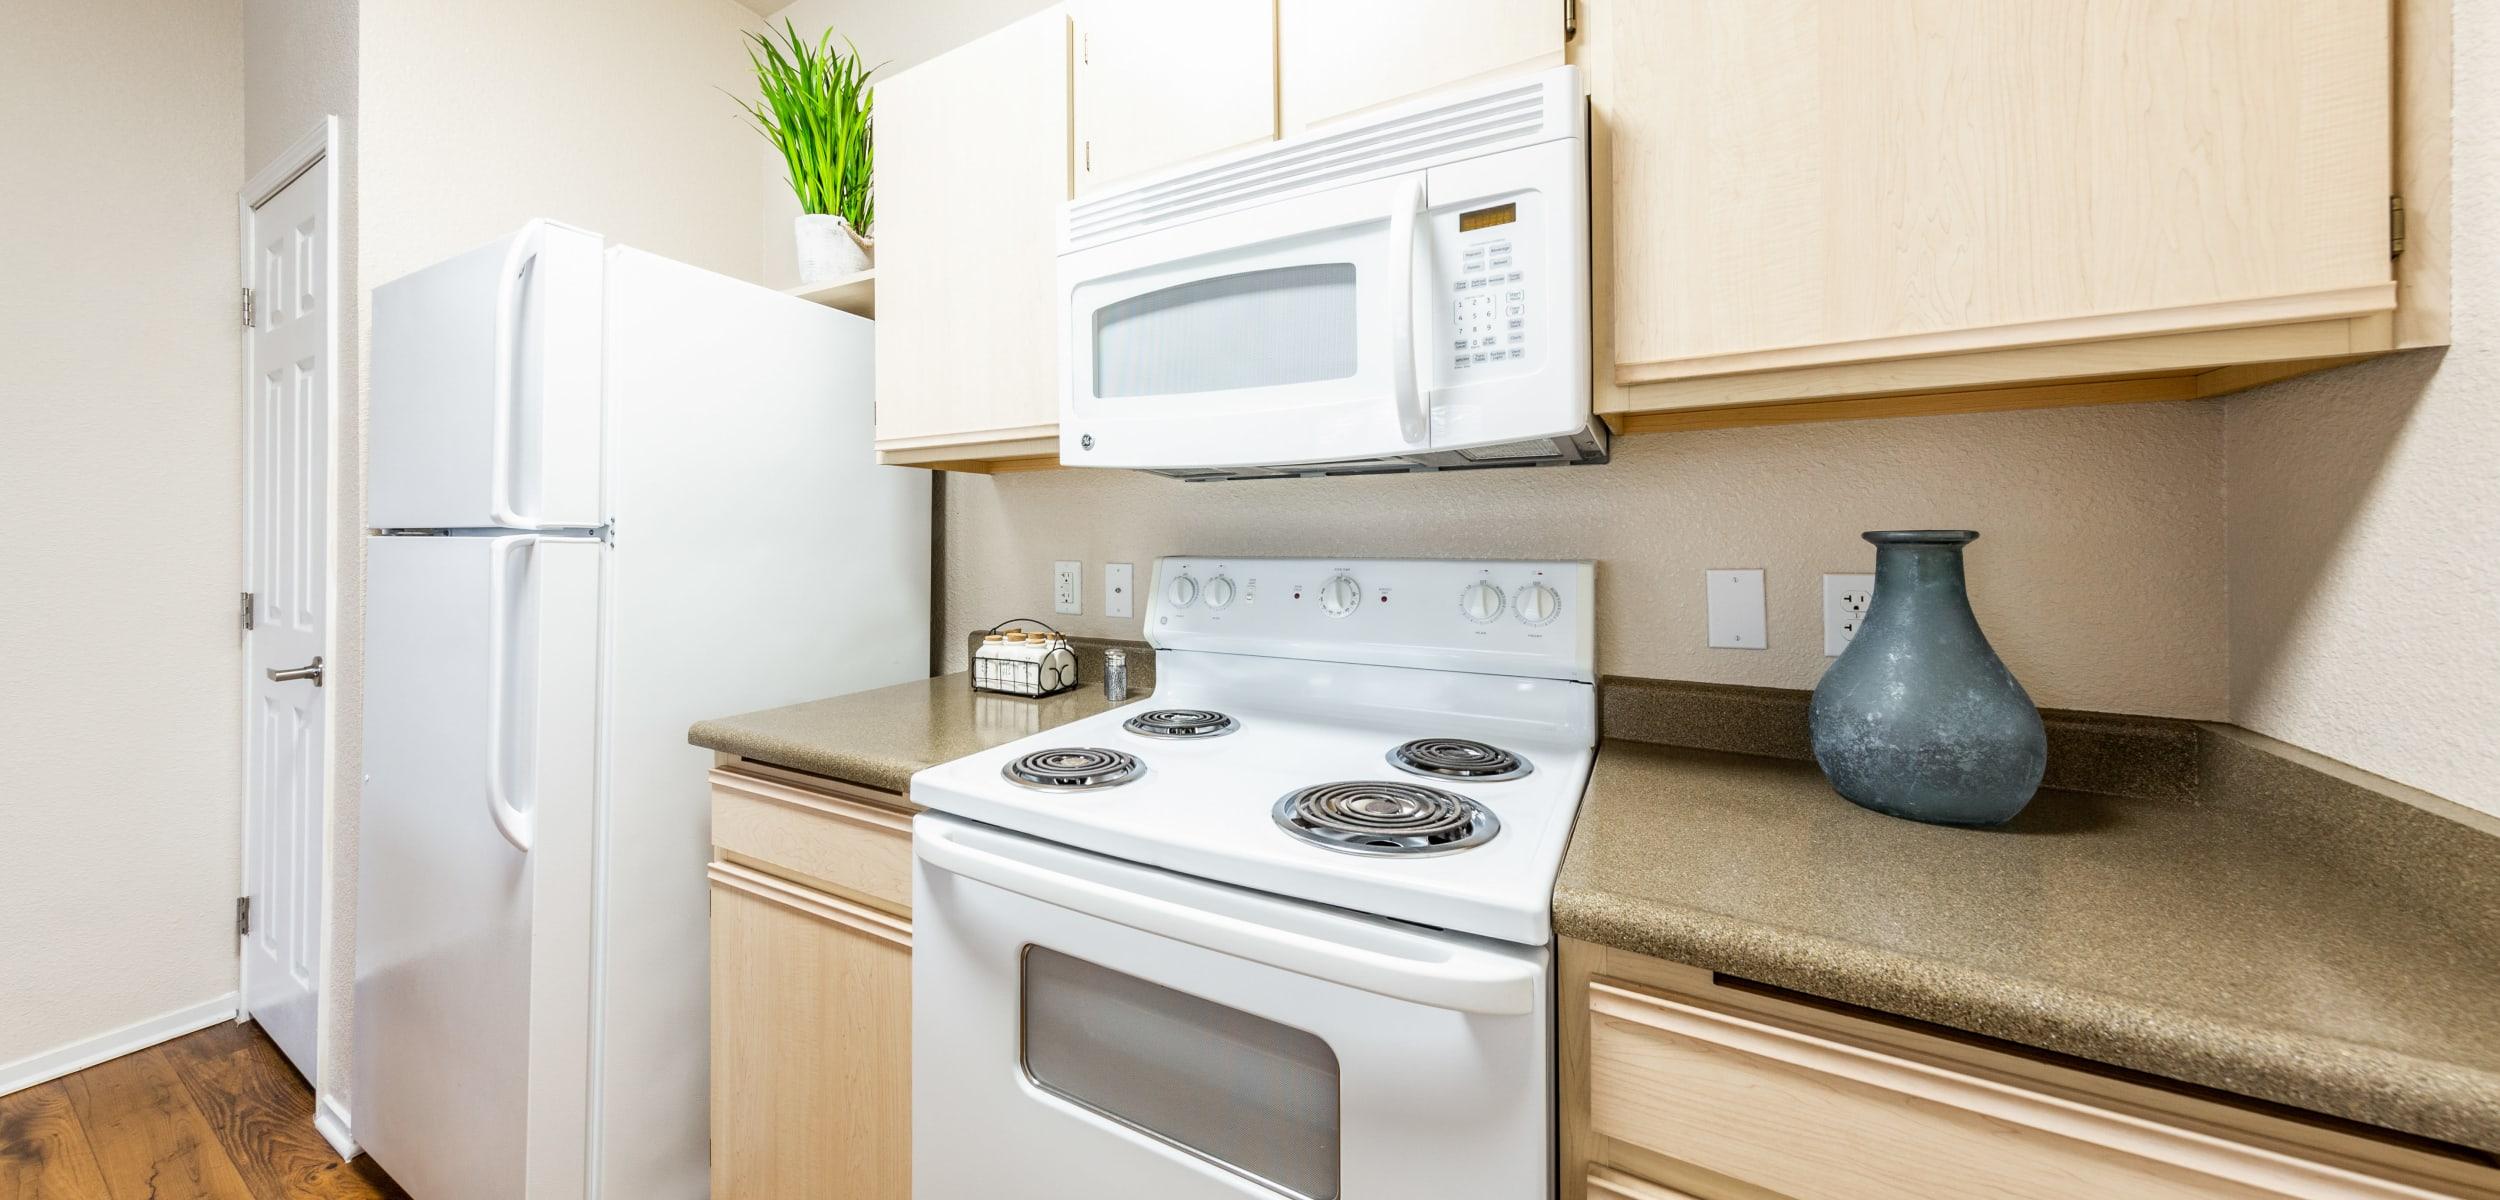 Modern, sleek kitchen at The Fairmont at Willow Creek in Folsom, California